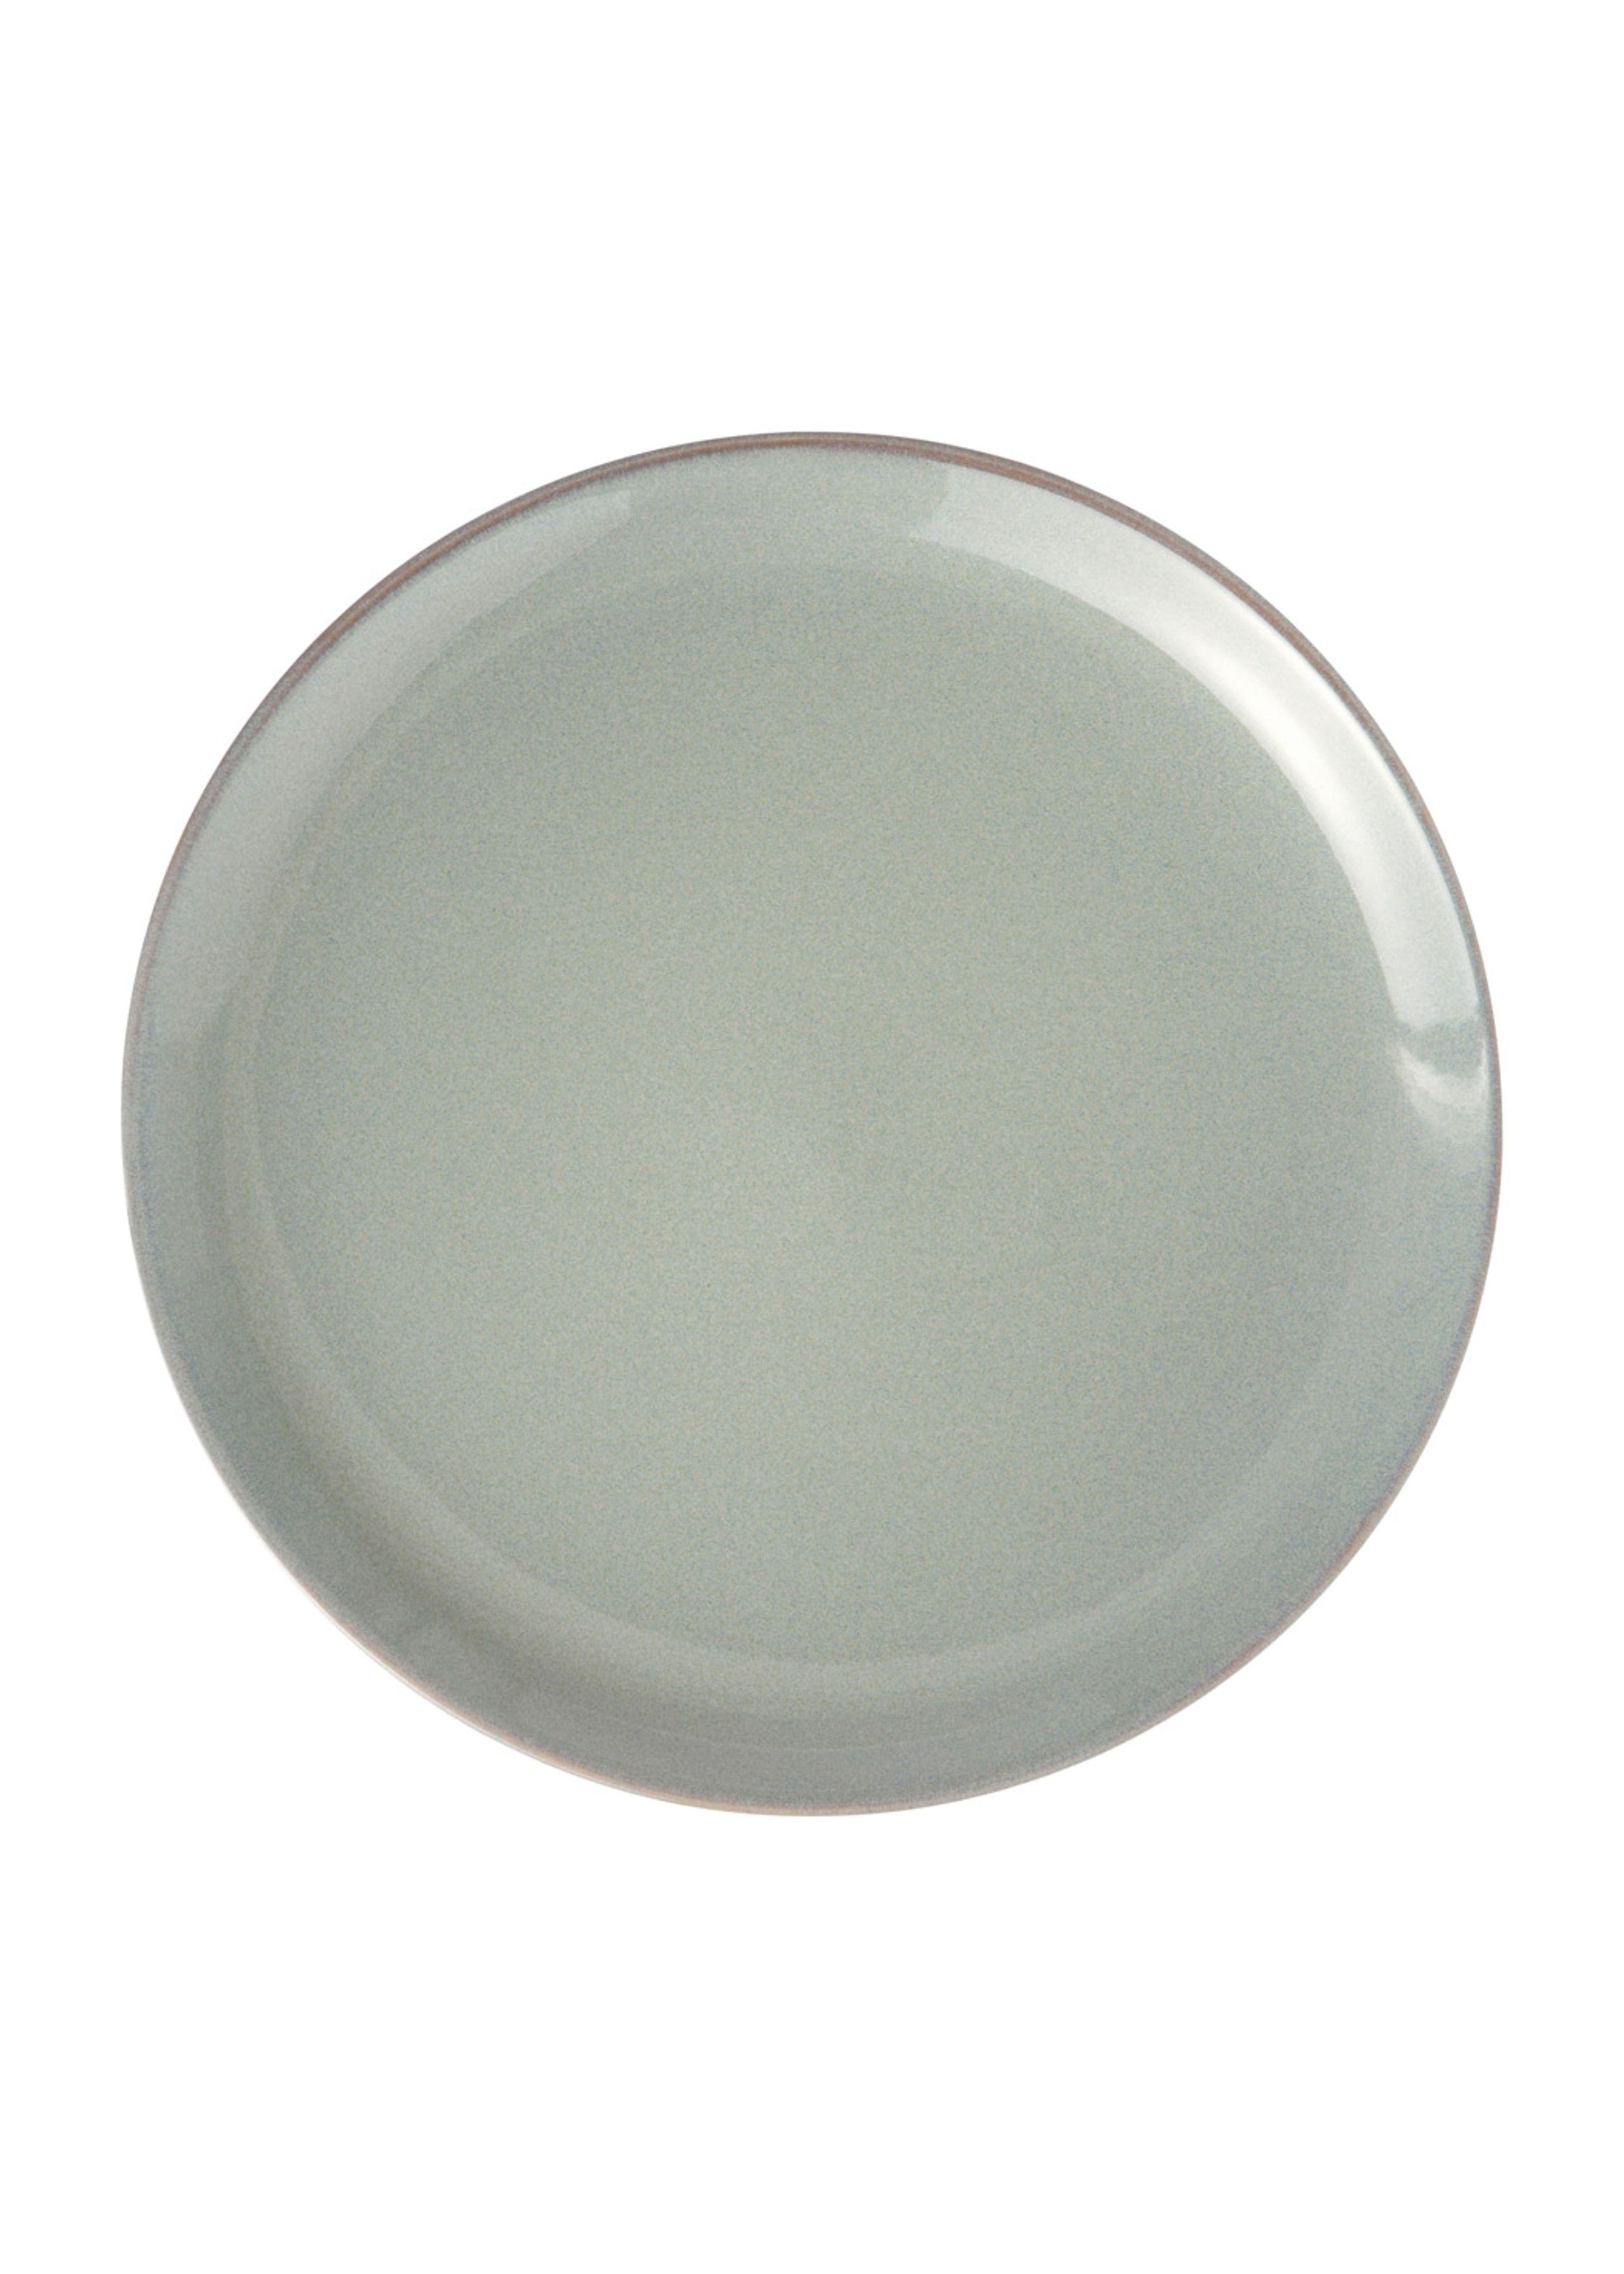 Image of   Neu Plate